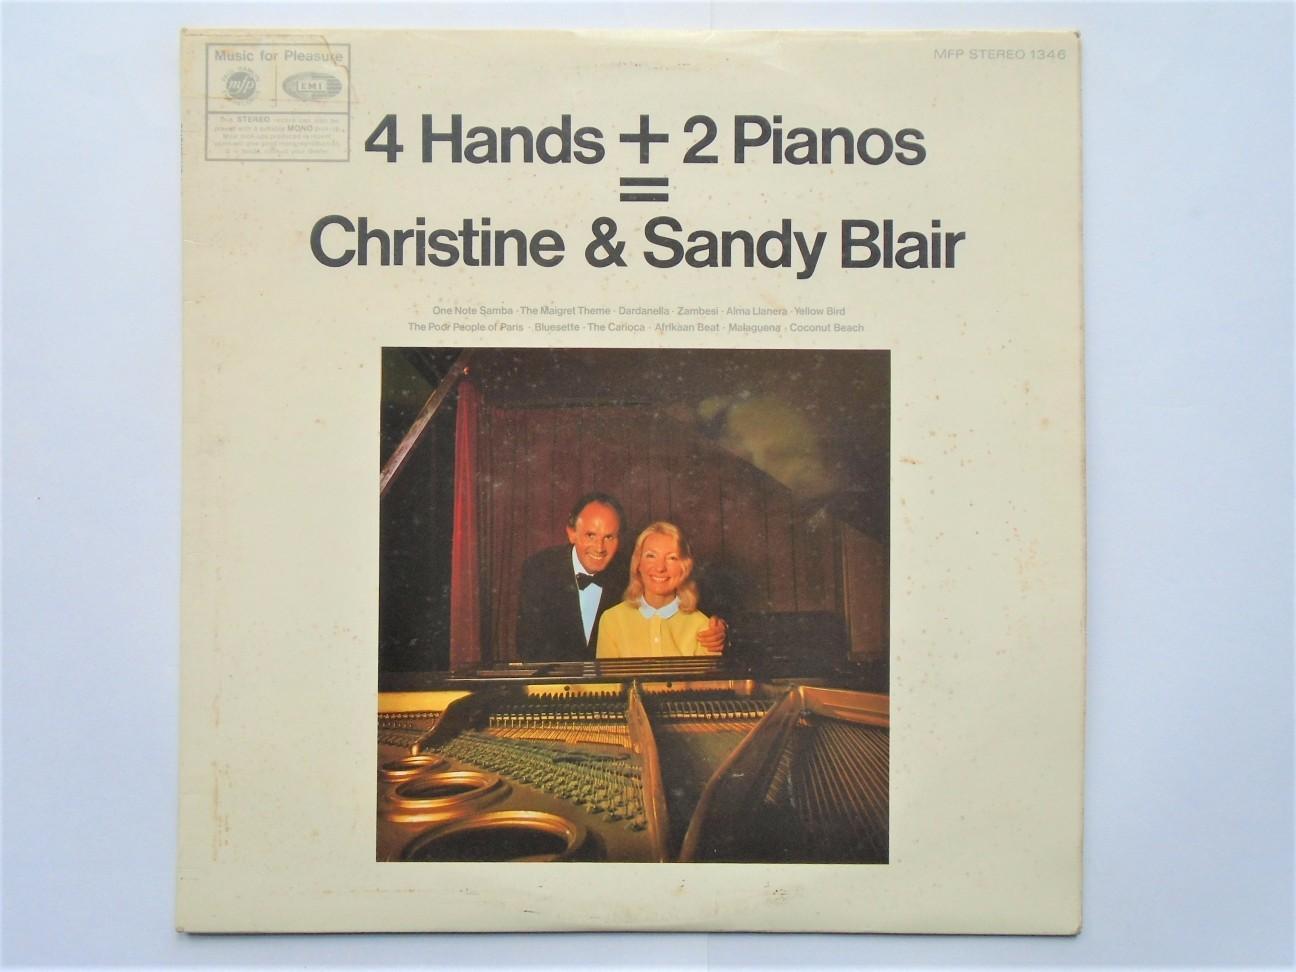 Christine & Sandy Blair 4 Hands And 2 Pianos